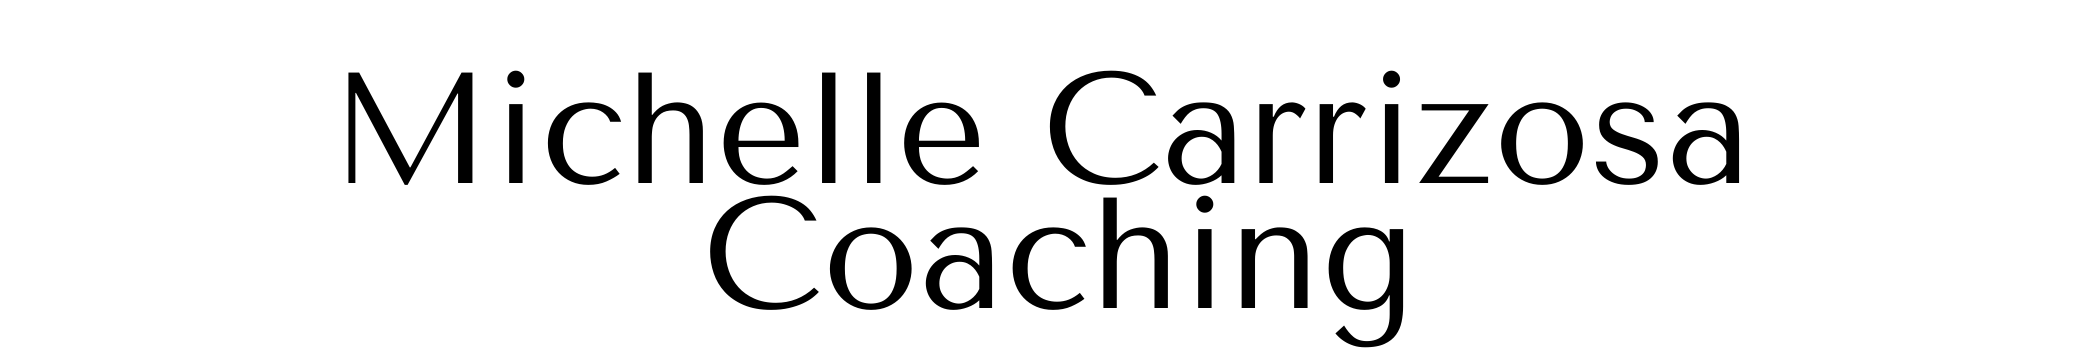 Michelle Carrizosa Coaching